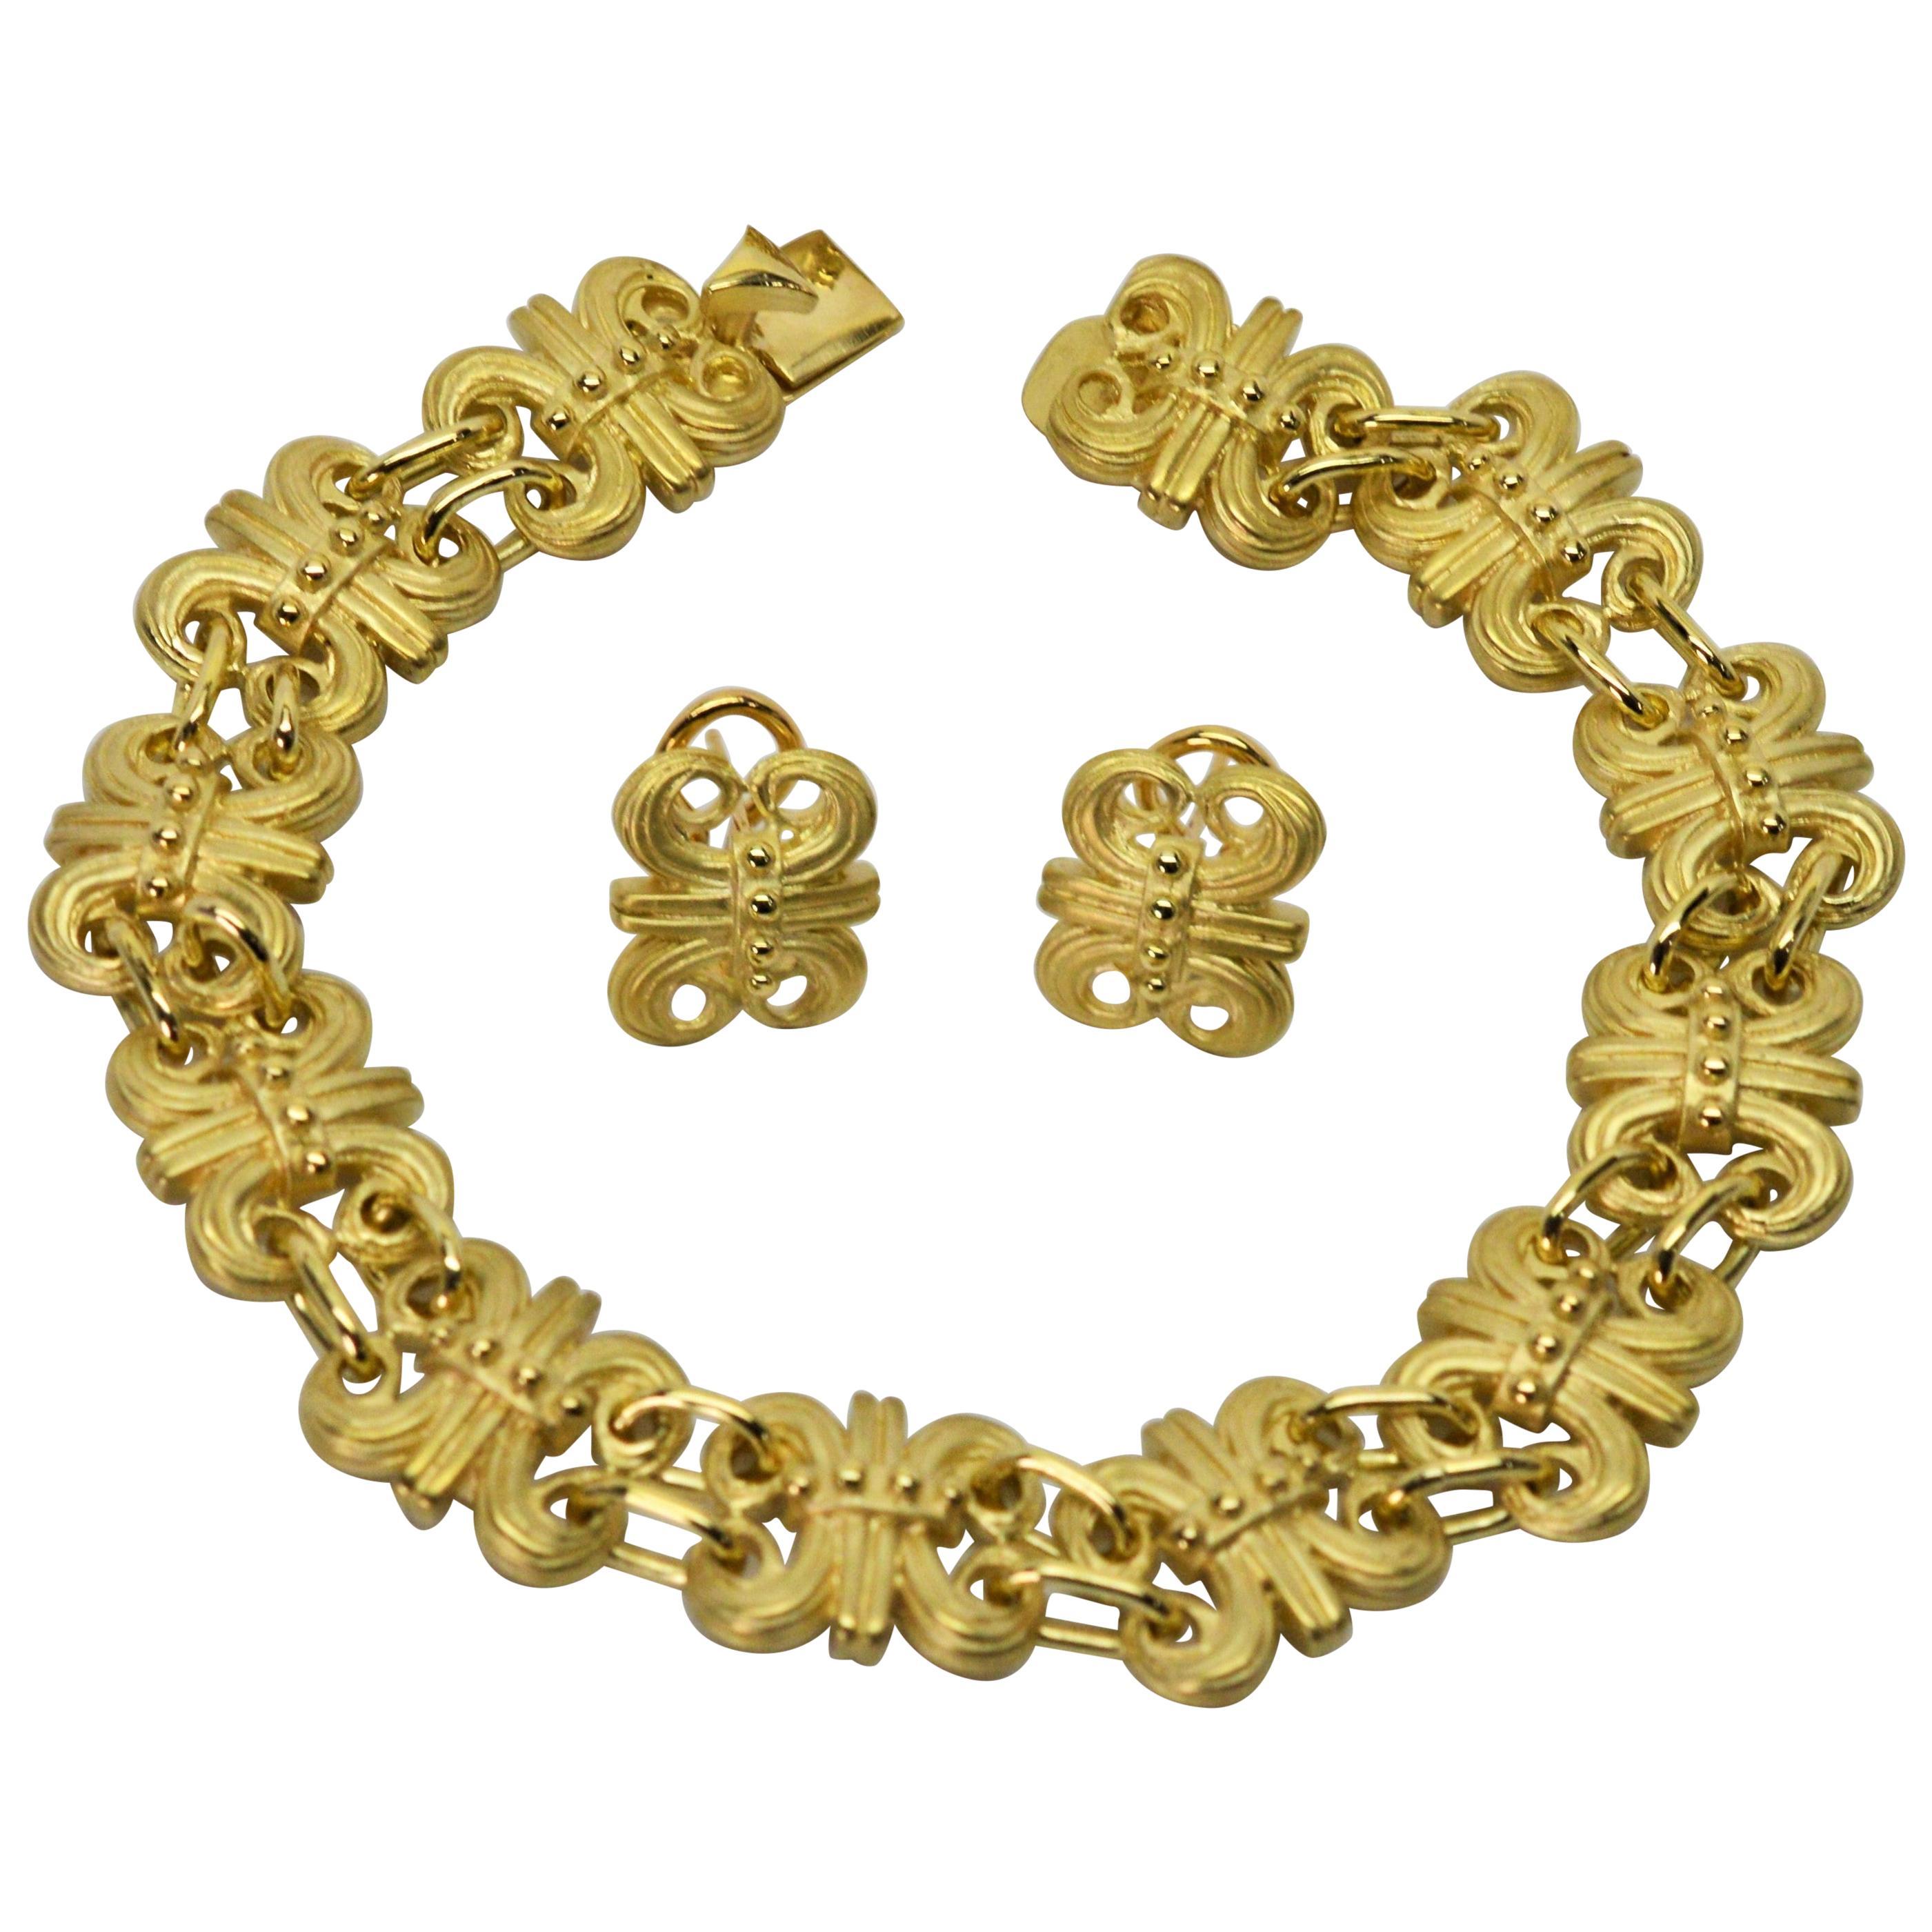 Satin Gold Fleur-de-Lis Bracelet and Earring Set